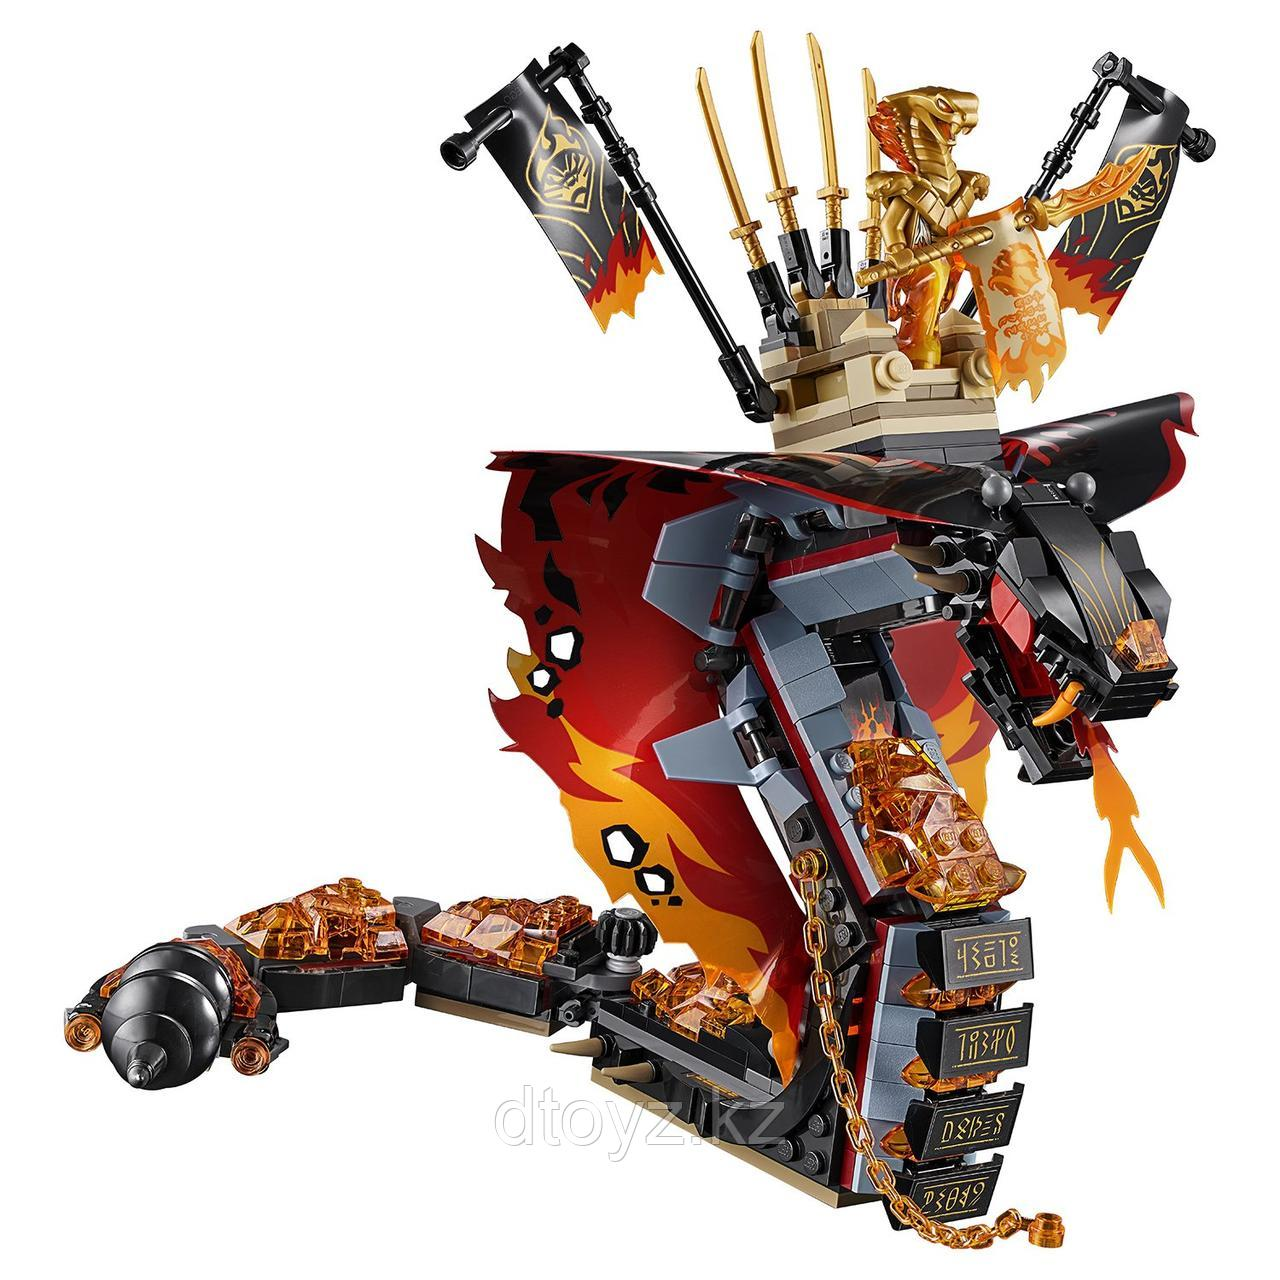 Lego Ninjago 70674 Огненный кинжал, Лего Ниндзяго - фото 3